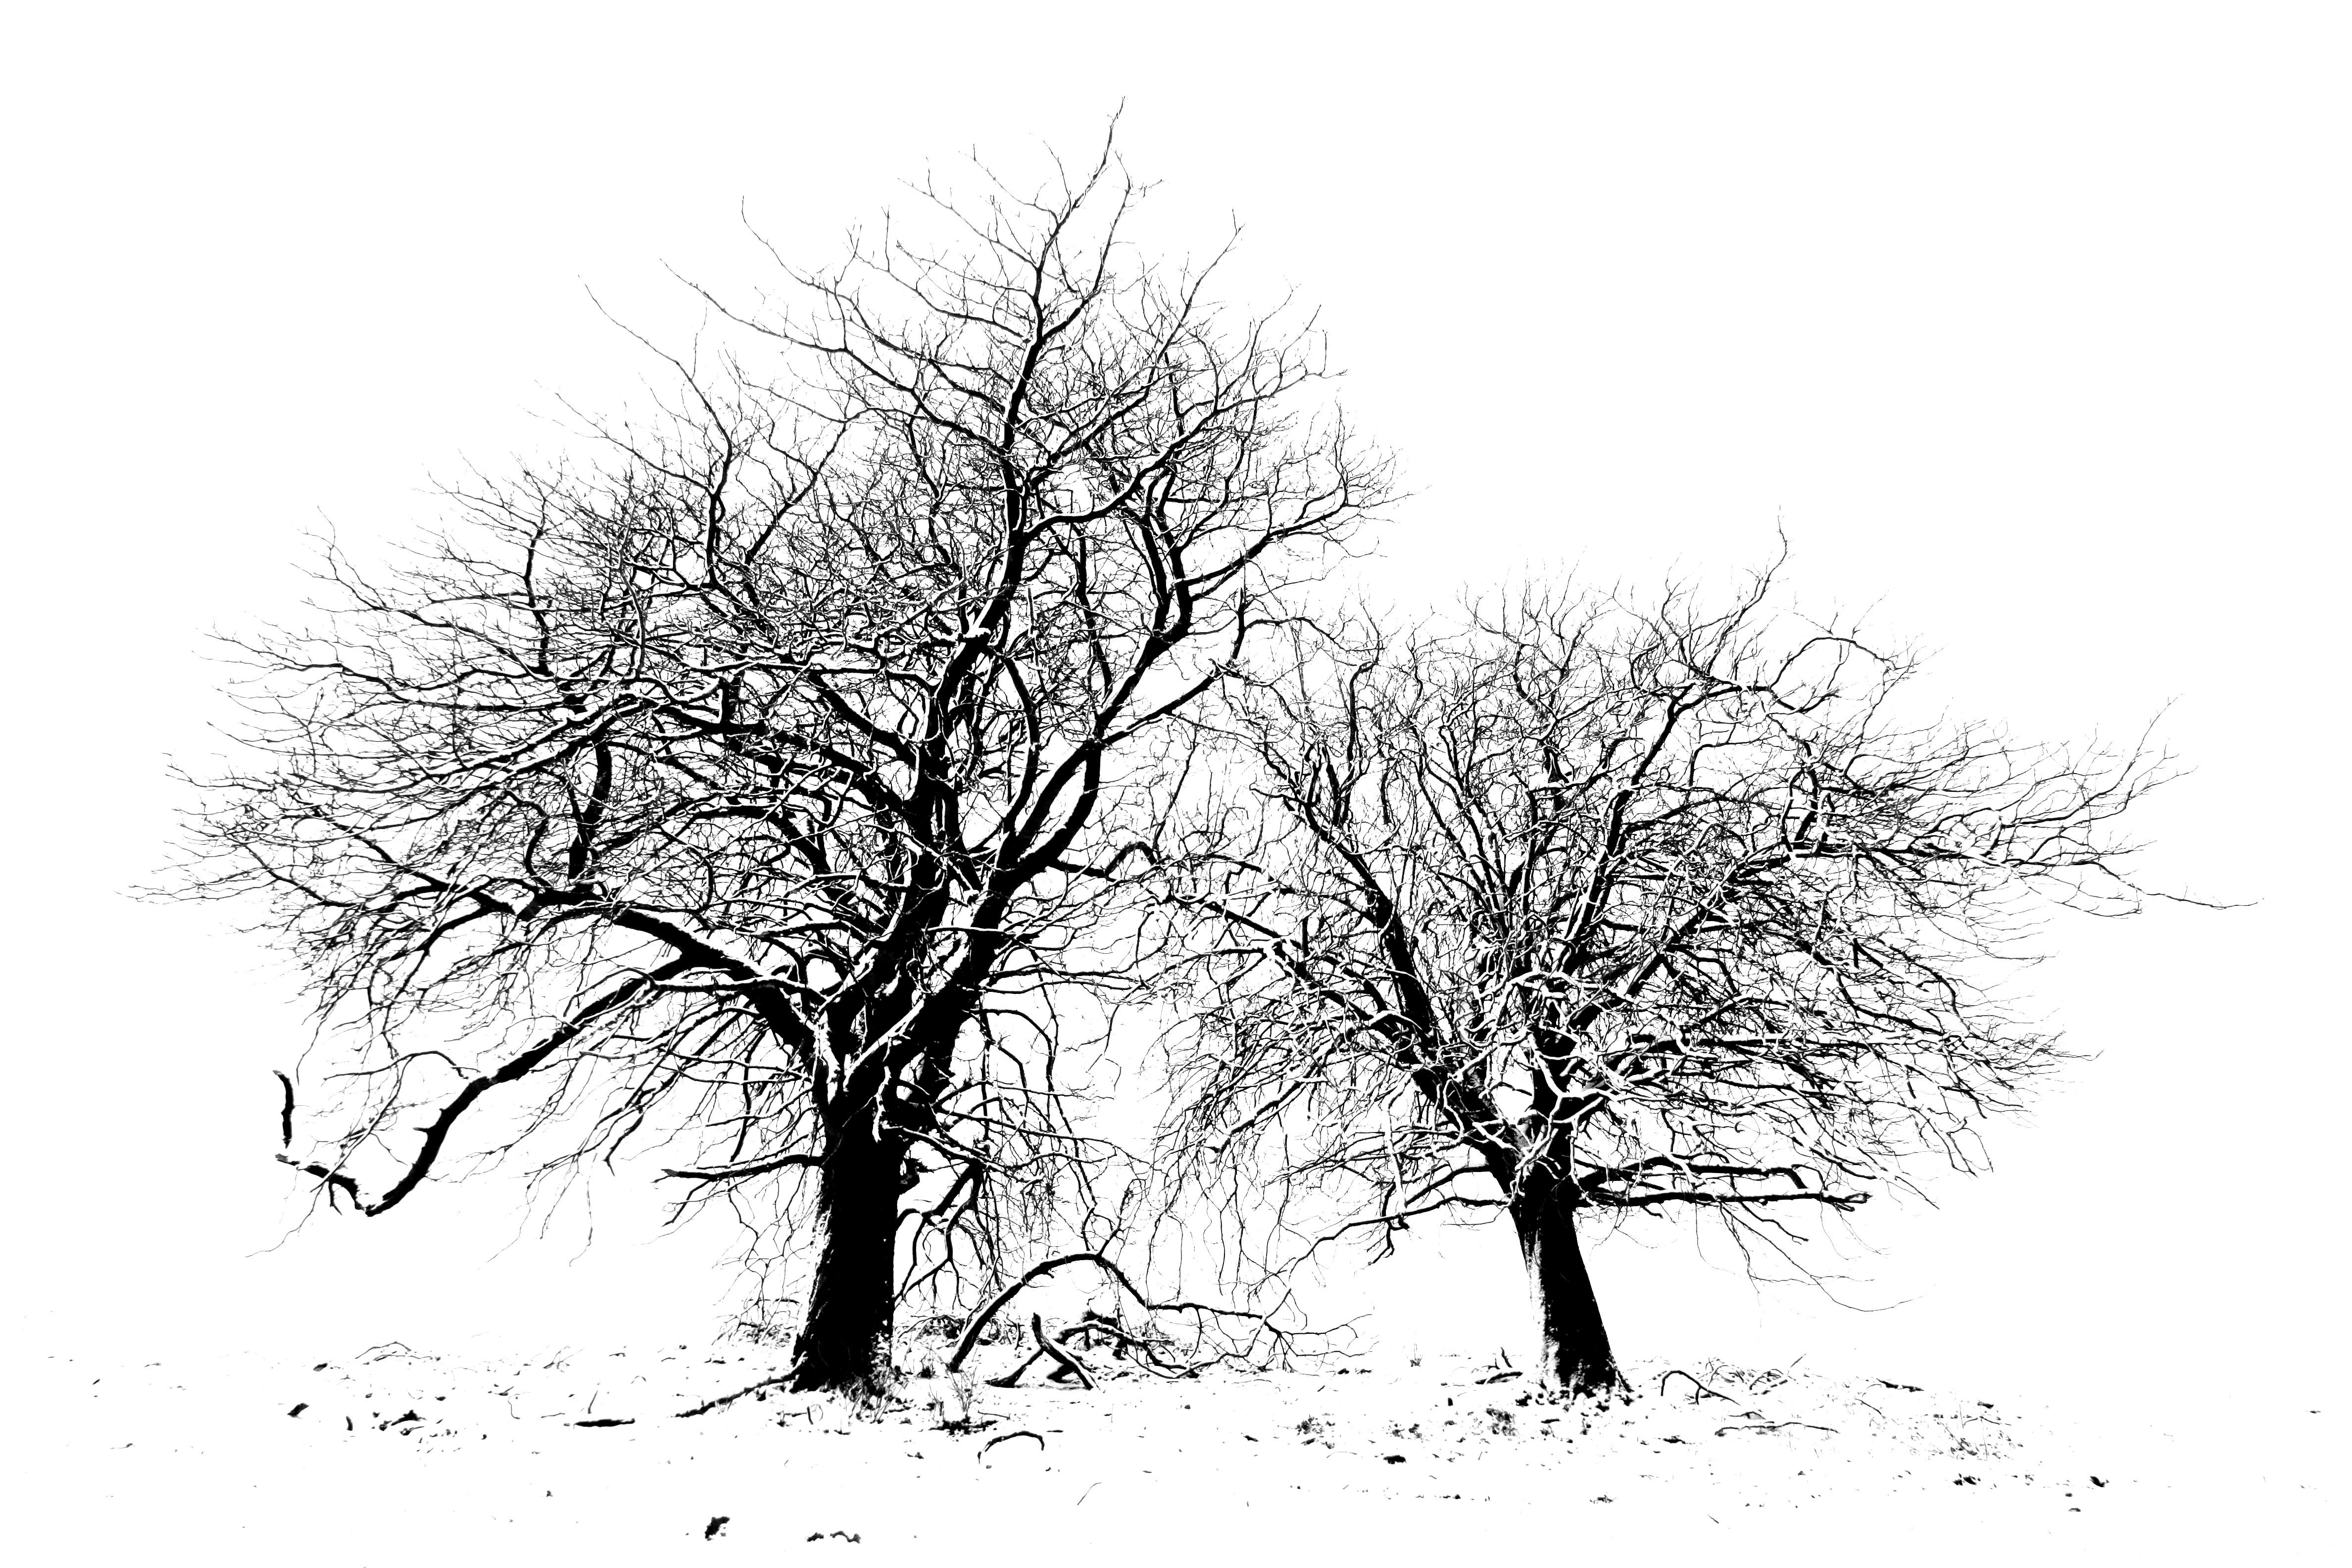 Brush TwoTrees